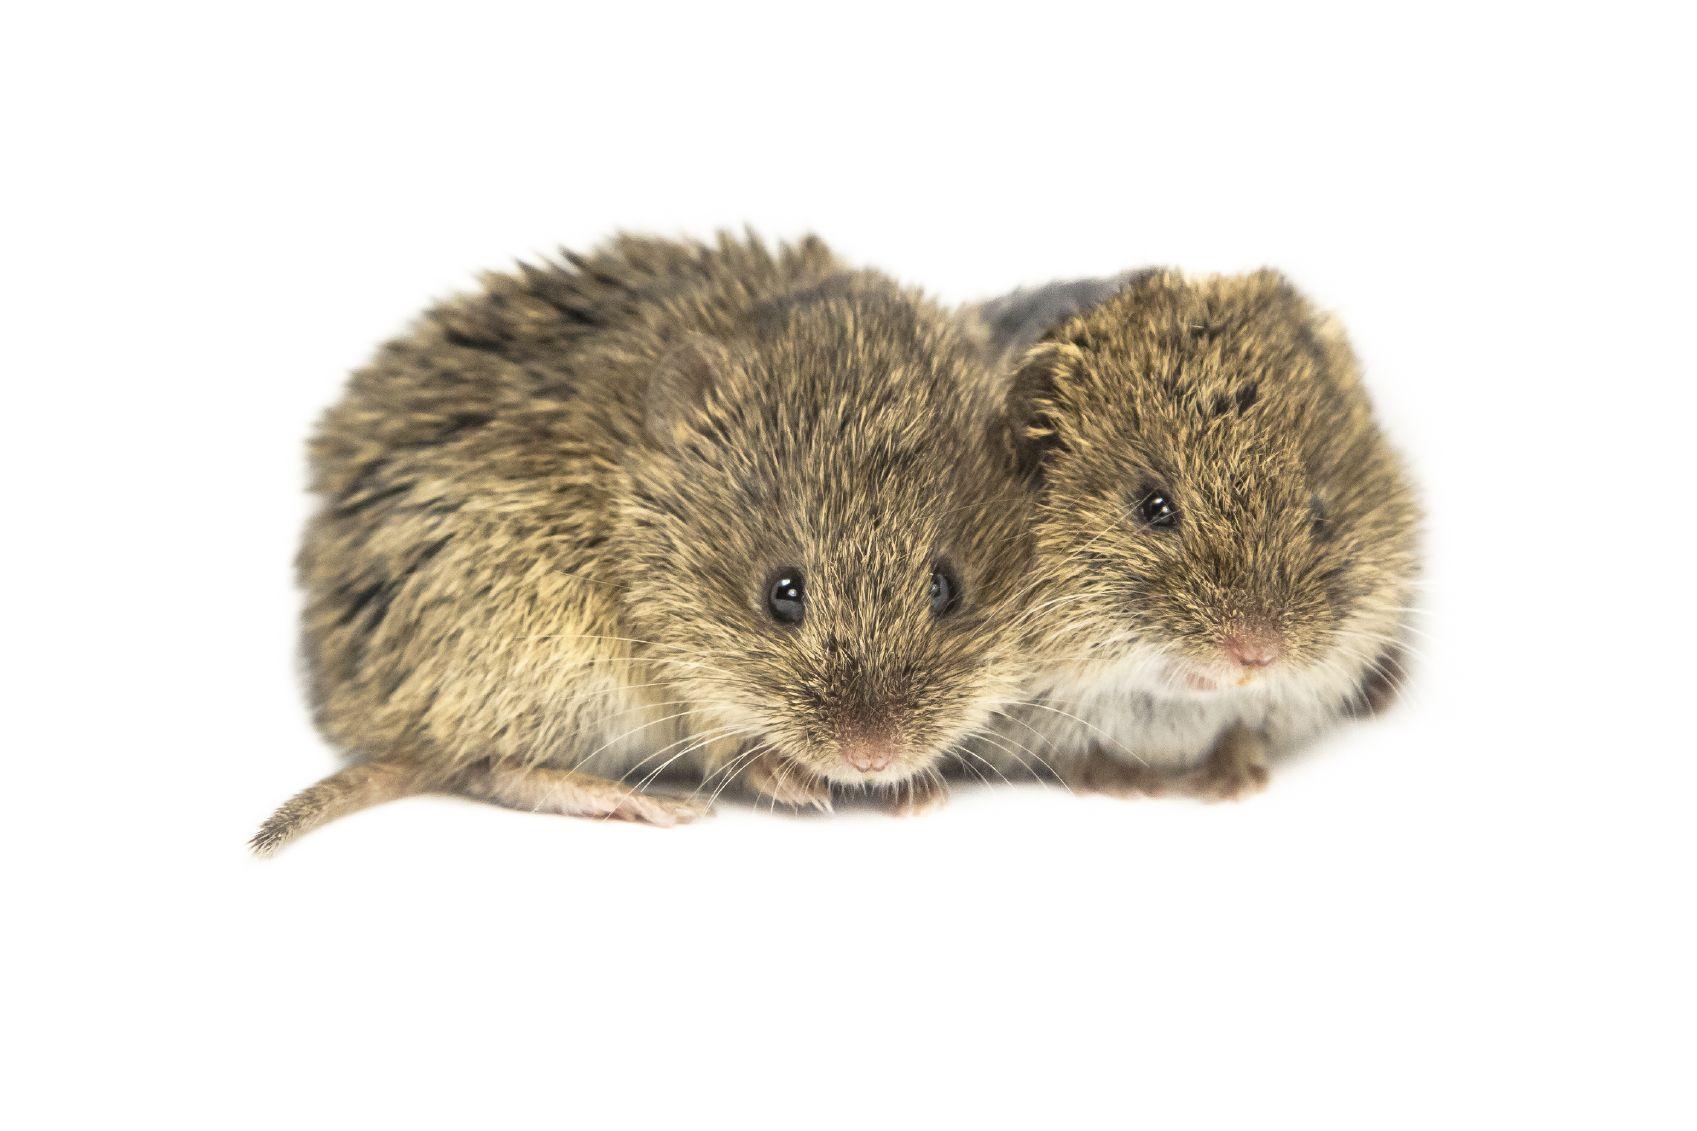 Animal News | Animals, Forest animals, Animal categories